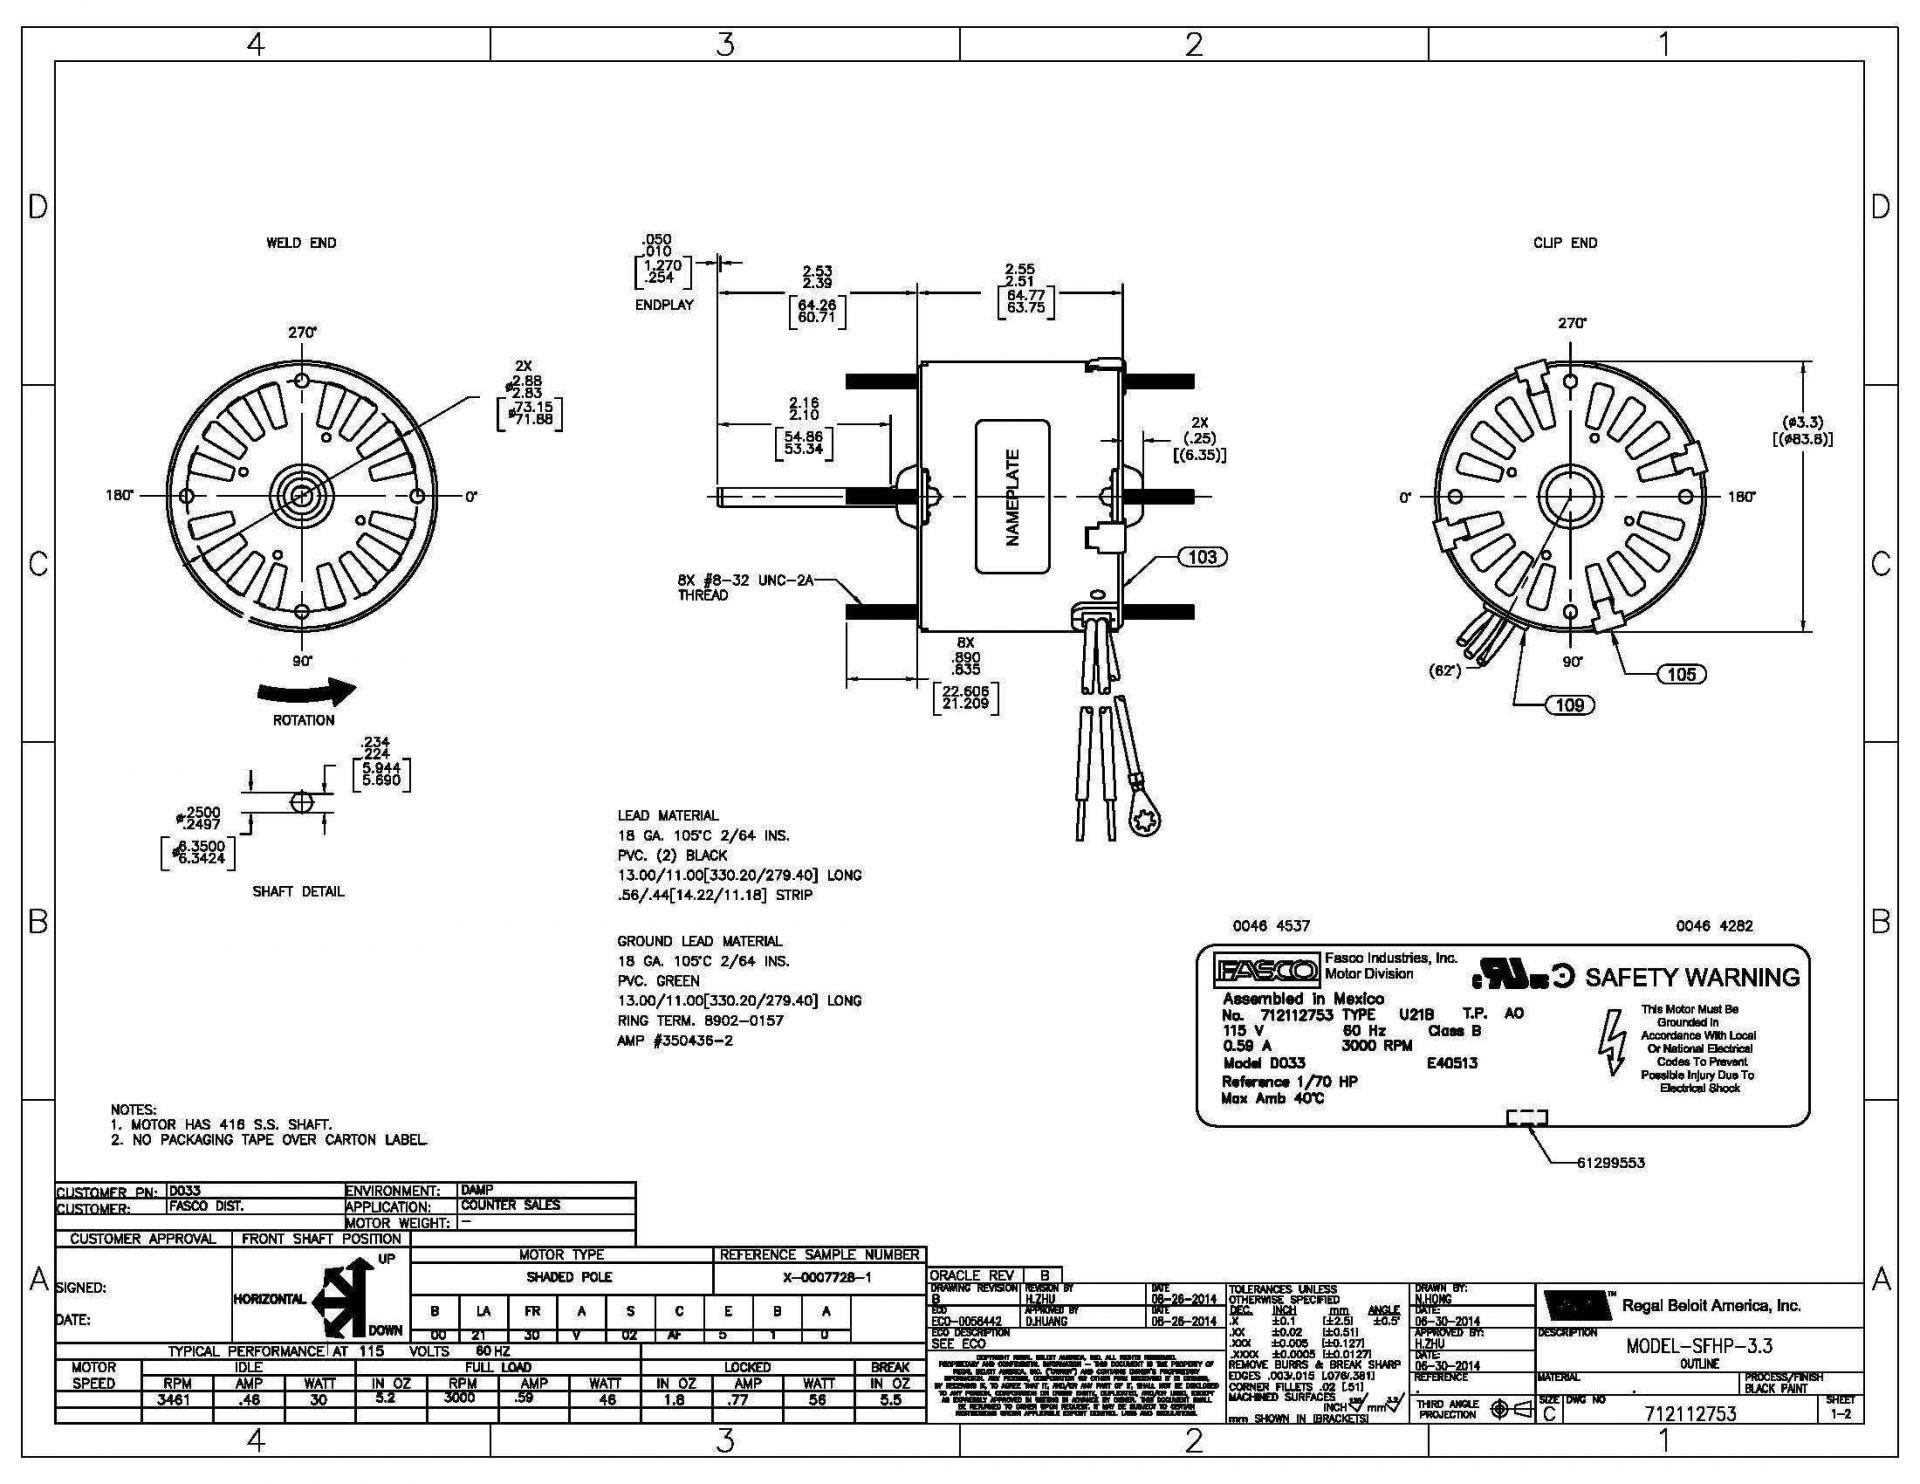 sta rite pump wiring diagram Download-Fill Rite Pump Wiring Diagram Book Sta Rite Pump Wiring Diagram Beautiful Pretty Waterway Pump Wiring 10-k